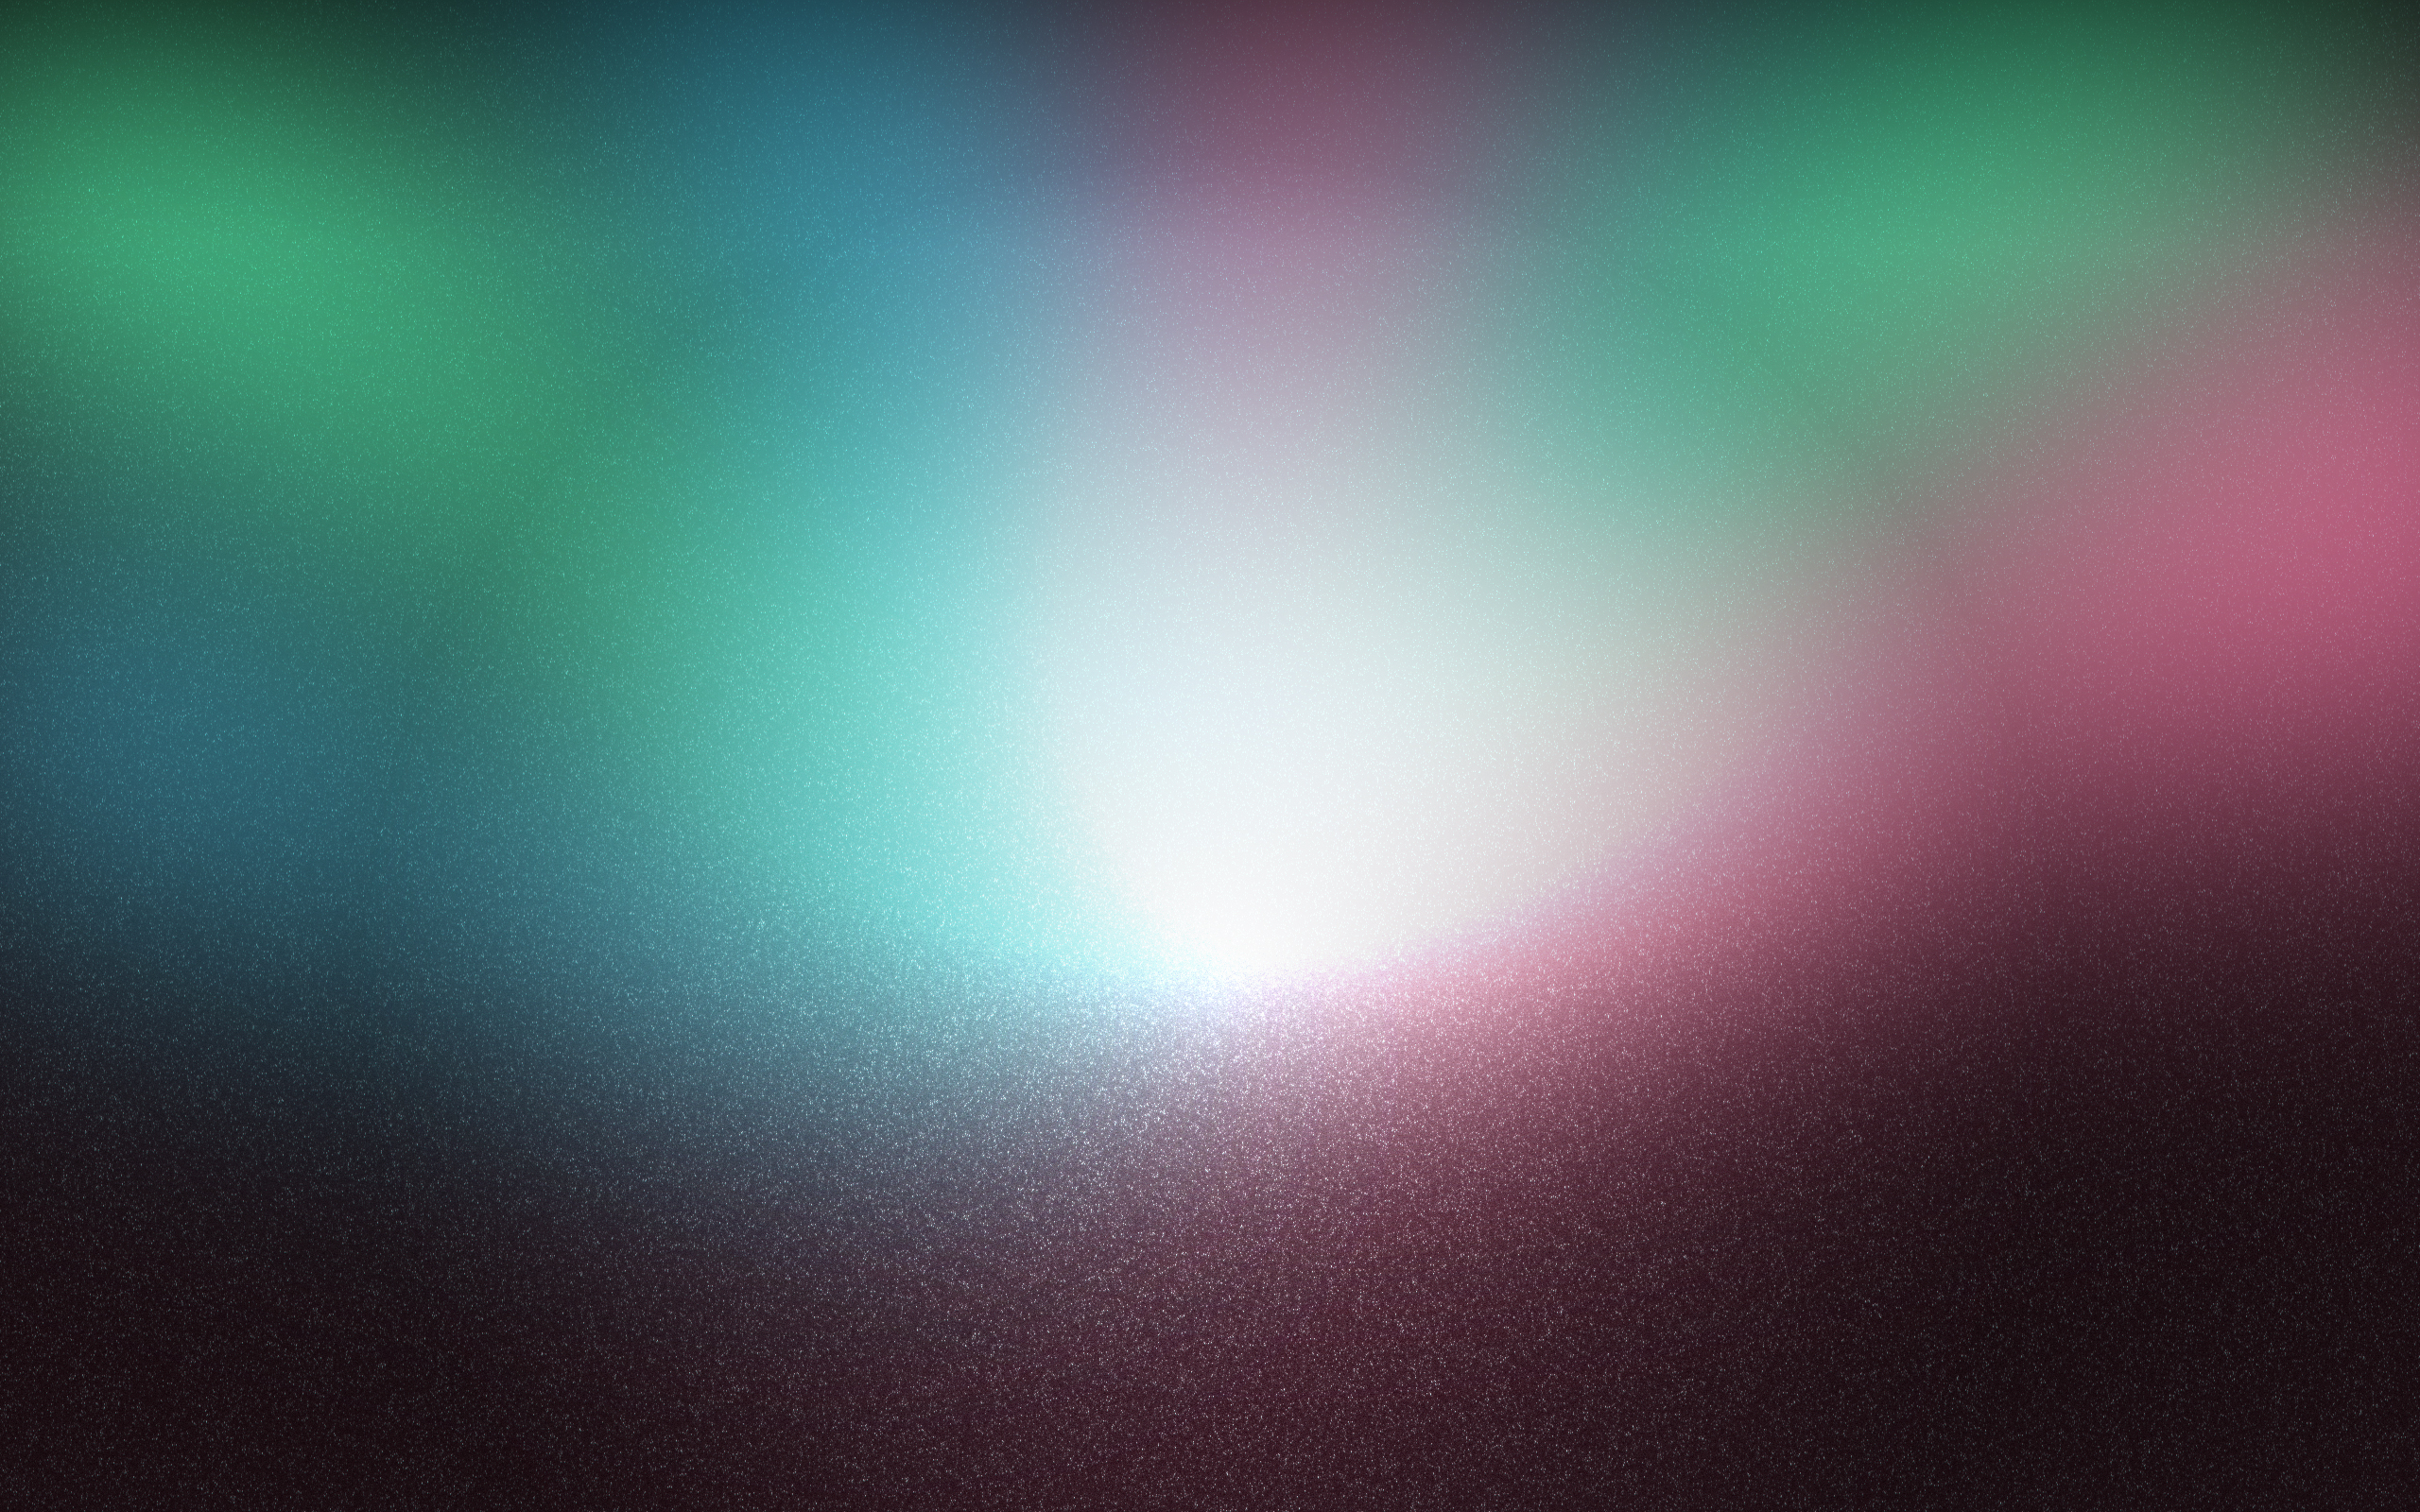 Vanilla Aura By Jathu 2560X1600 World Wallpaper Collection 2560x1600